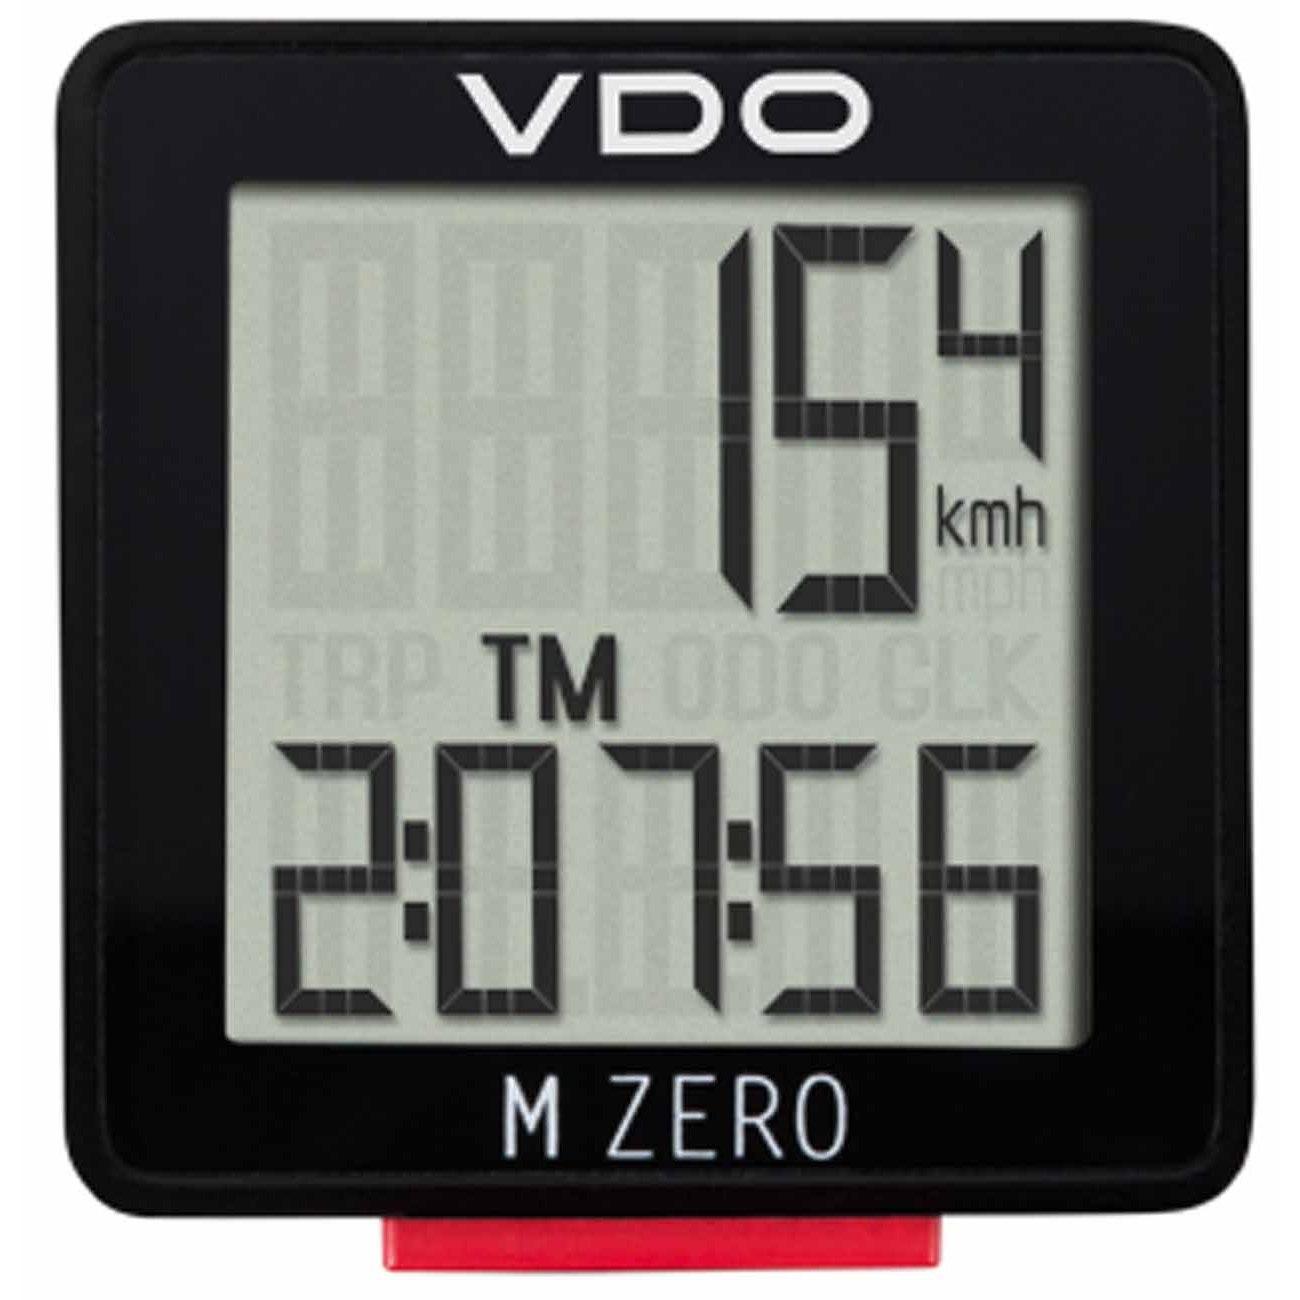 VDO M0 (ZERO) Cycle Computer